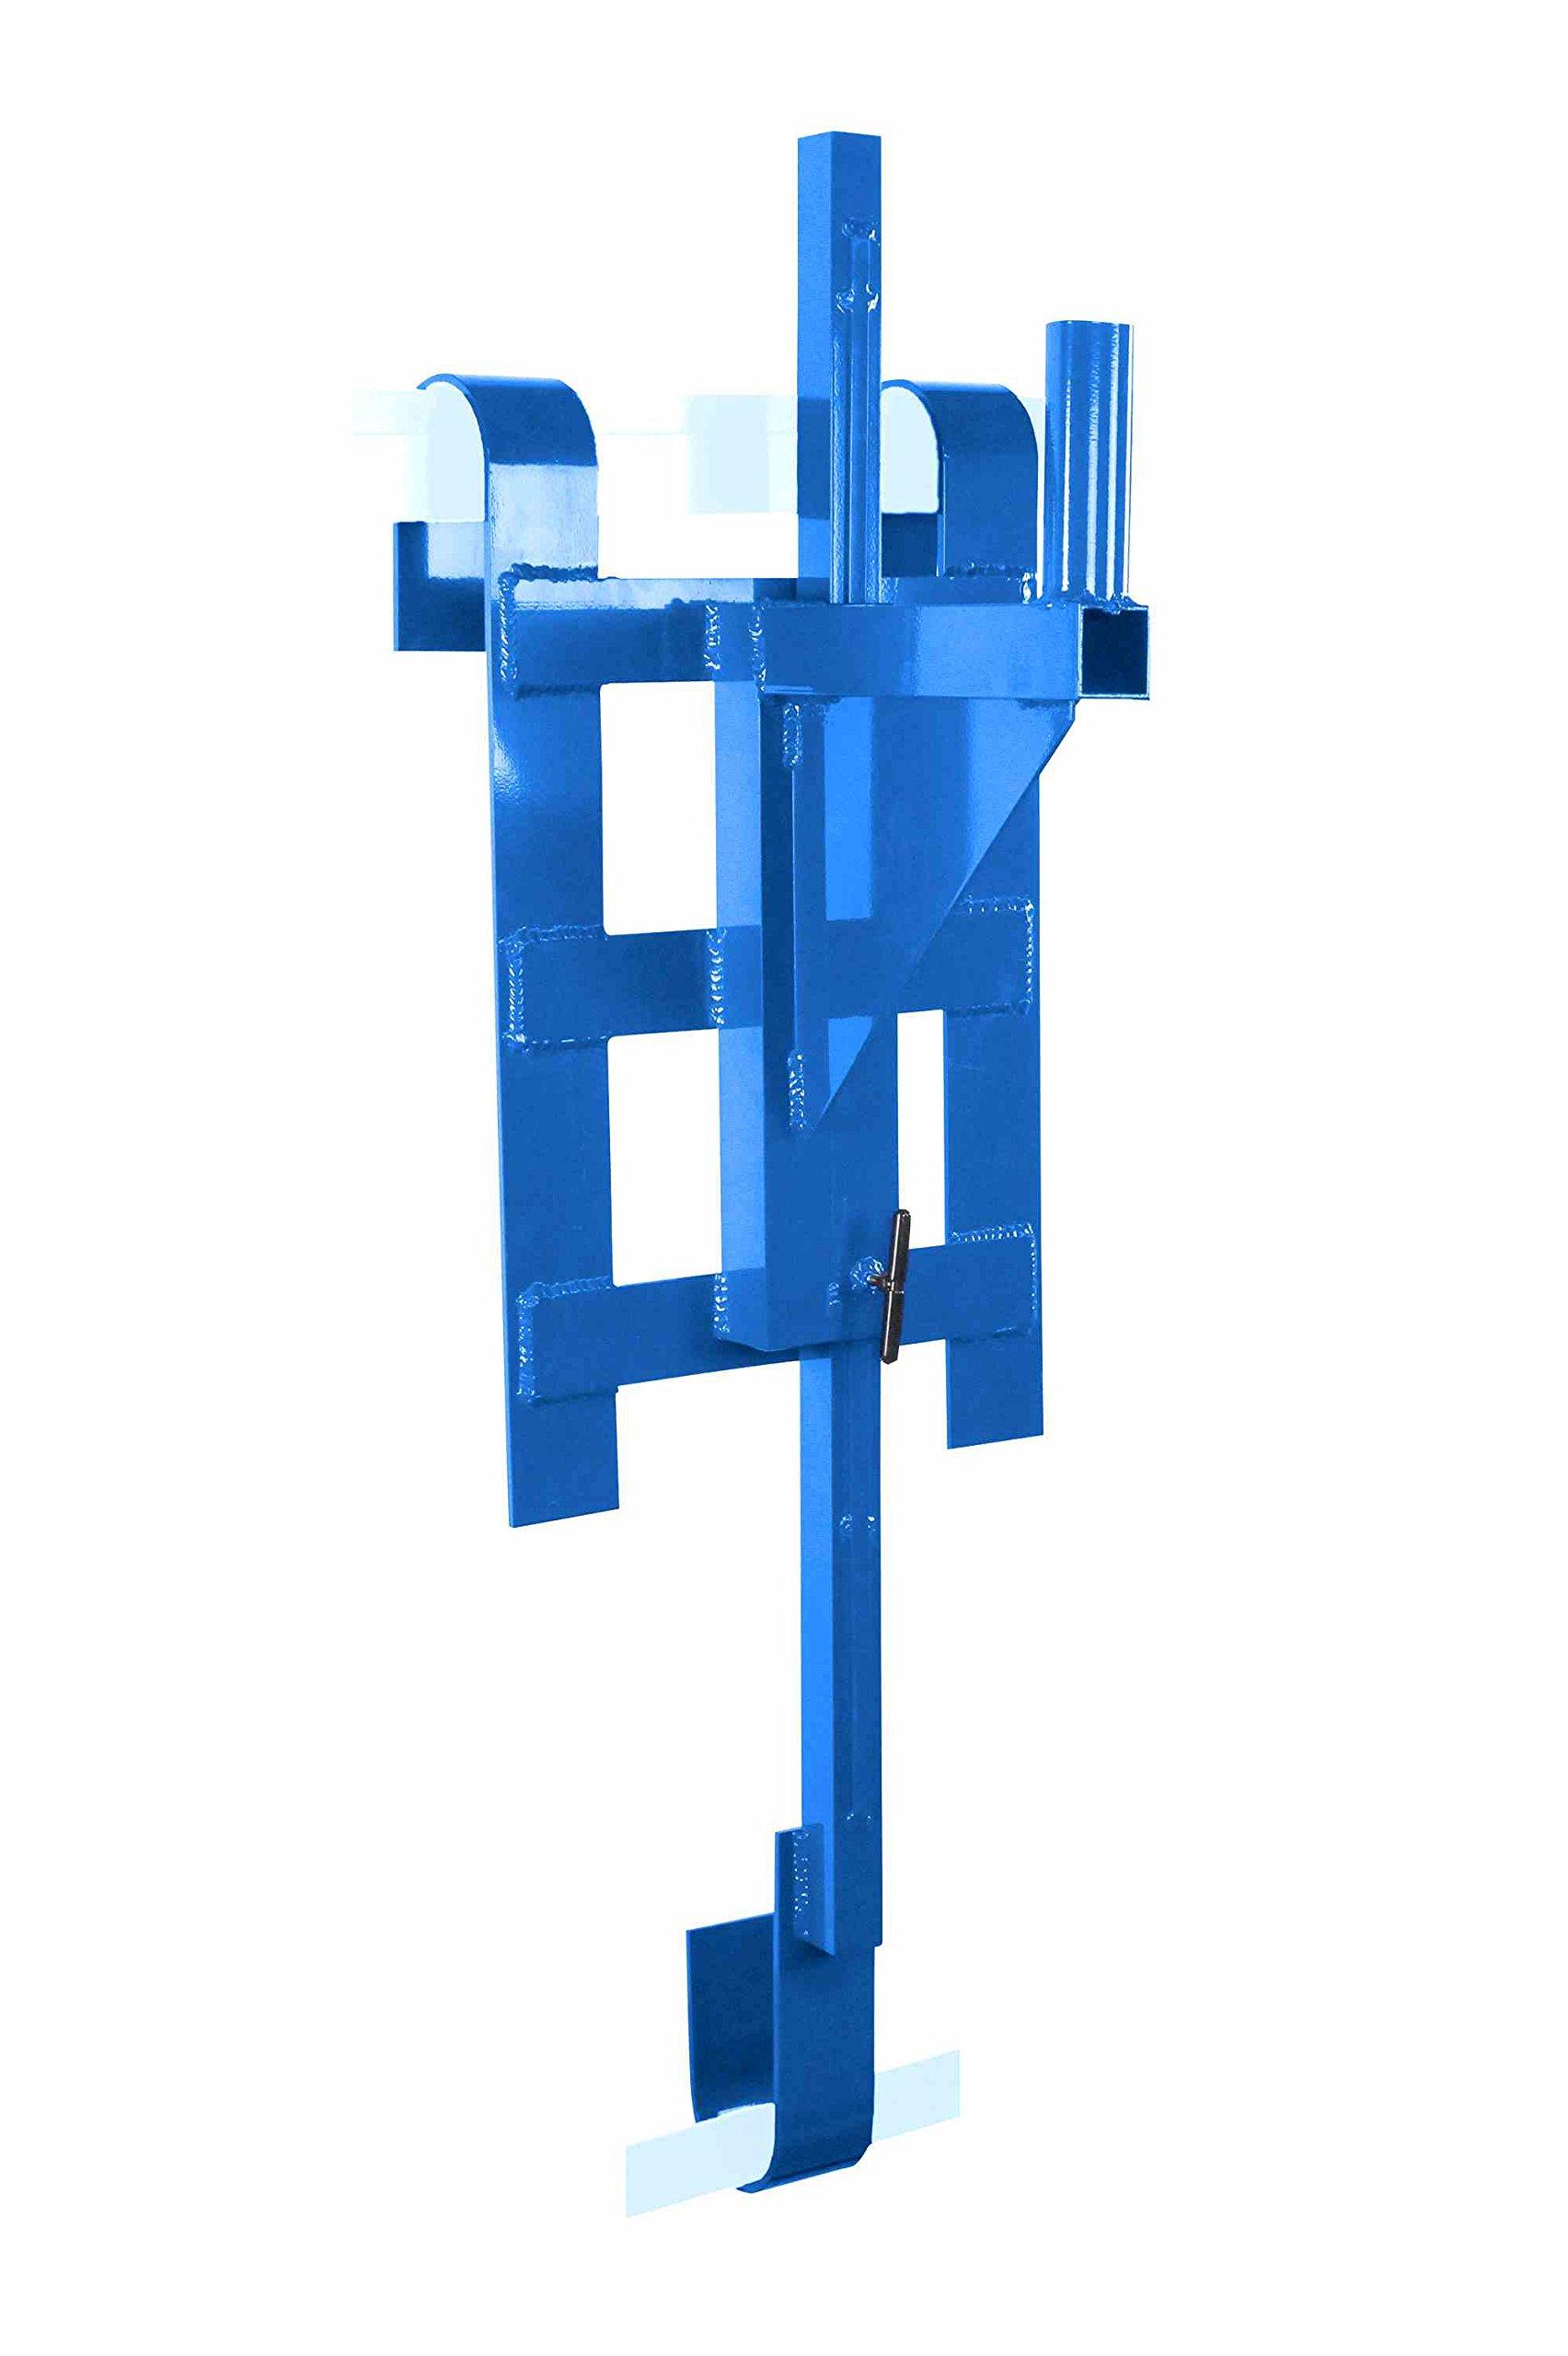 Adjustable Aluminum Rail Mount Bracket - Scaffold / Ladder Rack Bracket - 1.9'' OD Top Mounting Stud by Larson Electronics